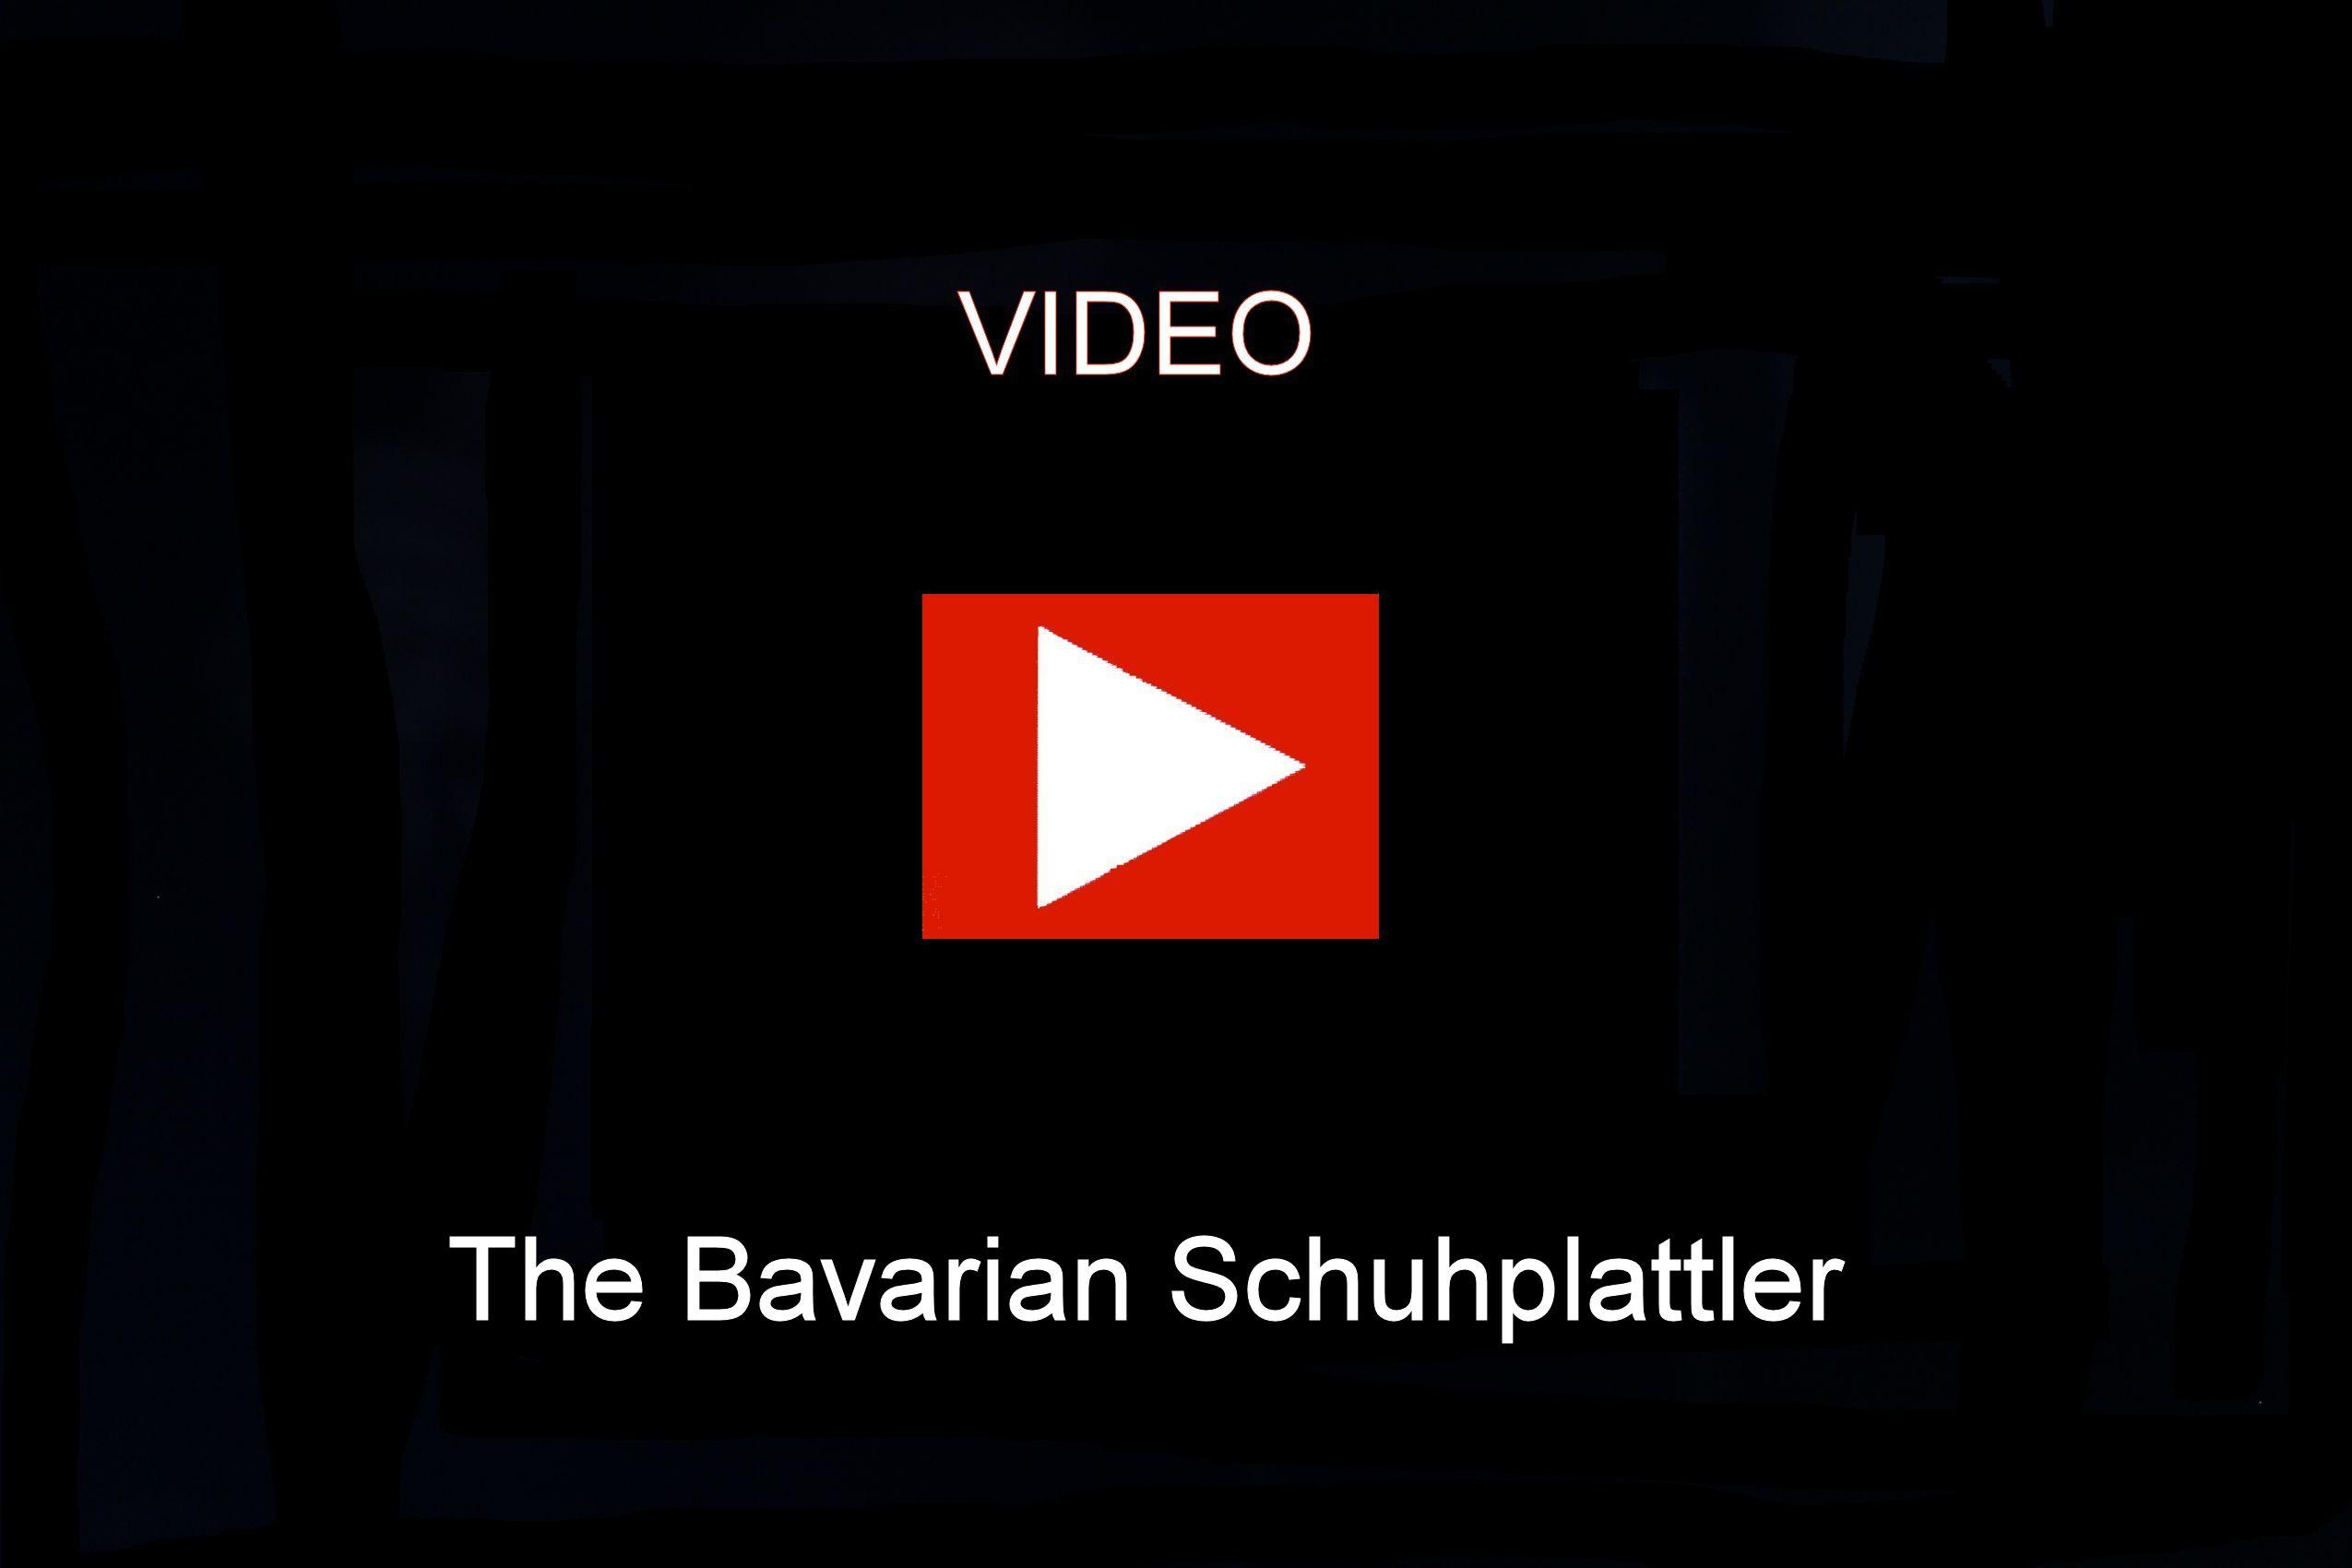 Trenkle - The Bavarian Schuhplattler  6,3 Inches